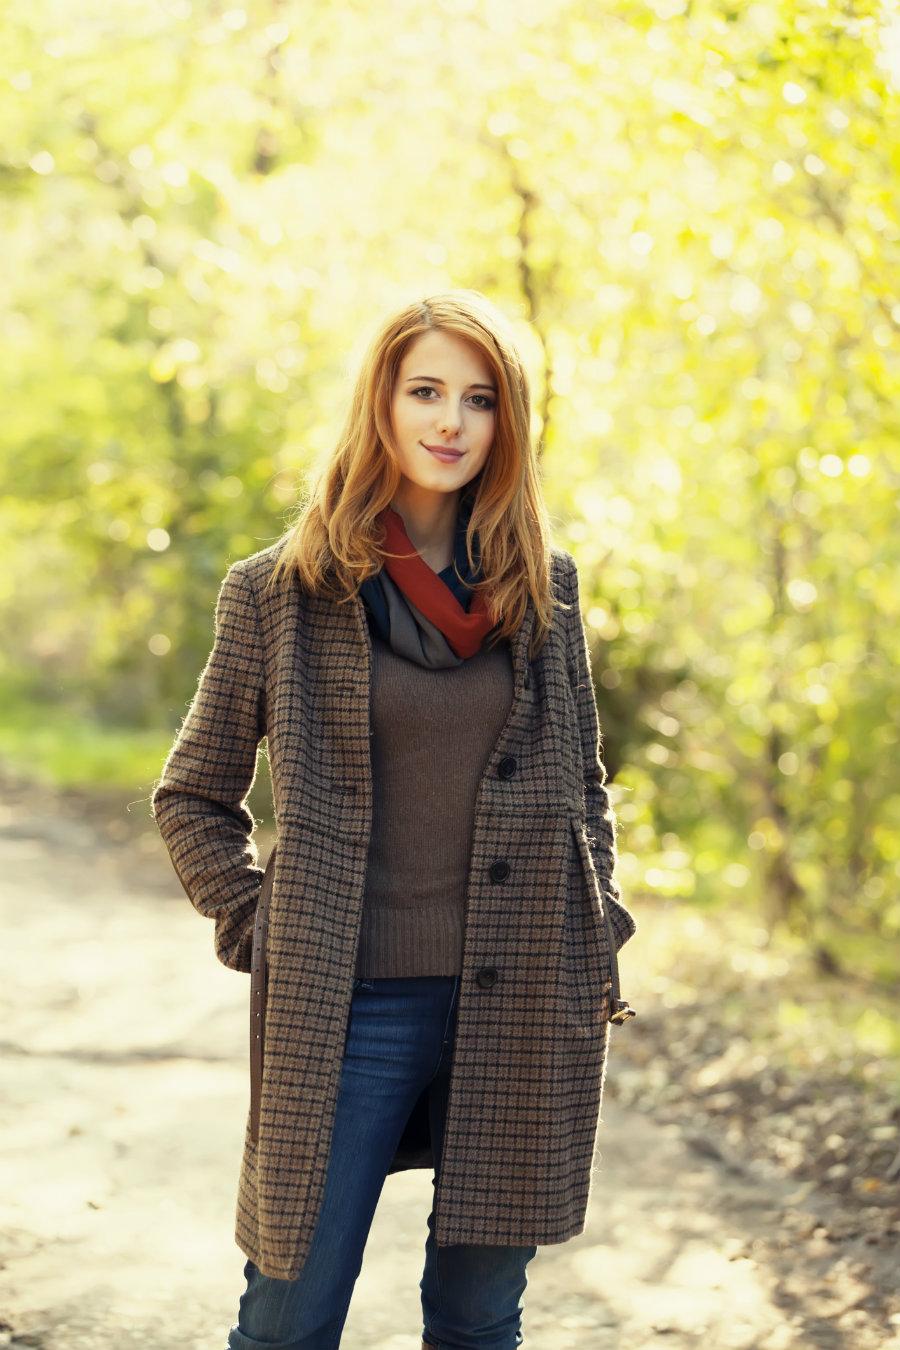 consejos-para-comprar-abrigos  4